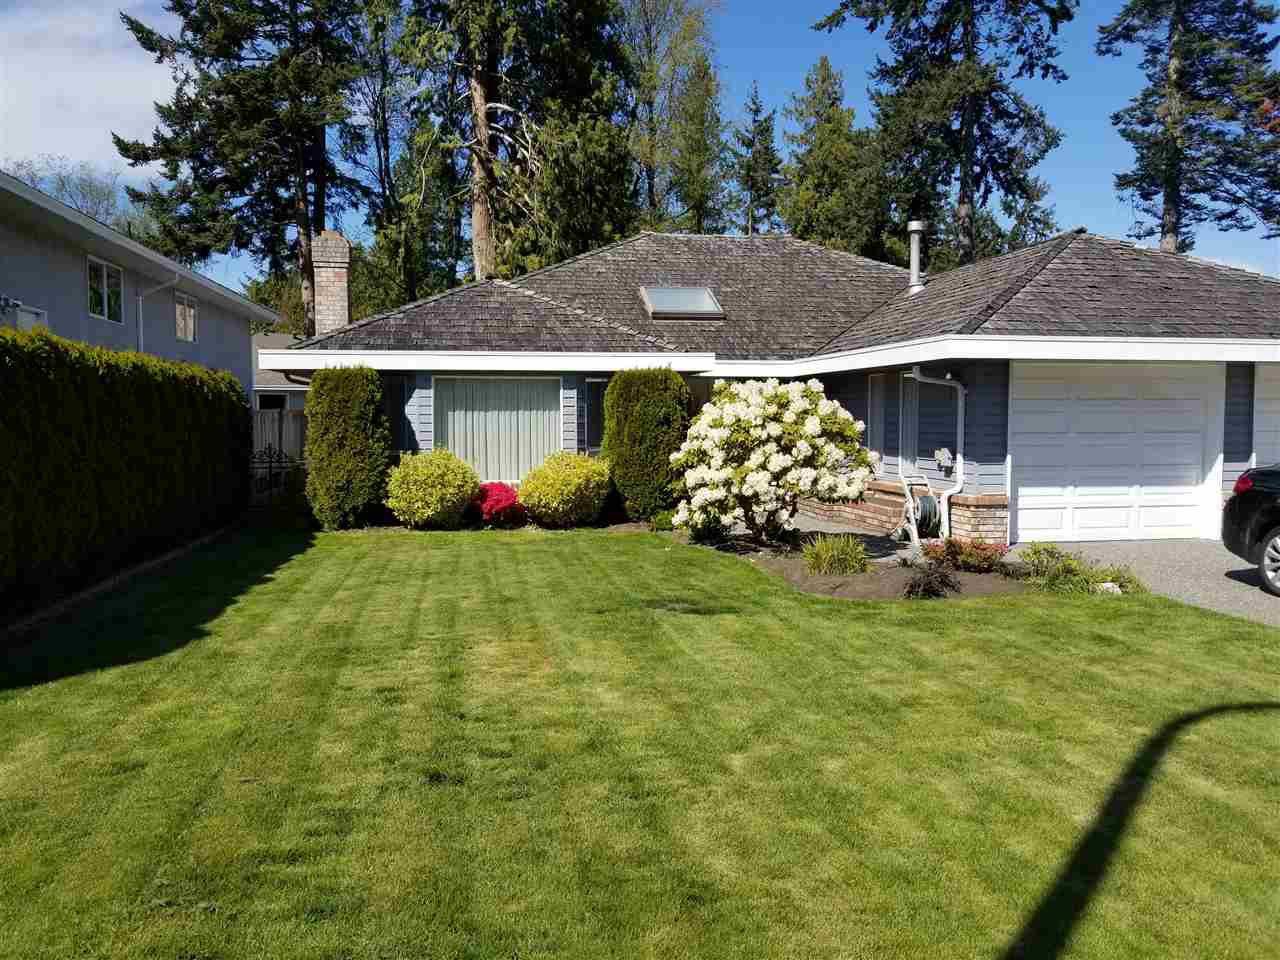 Main Photo: 4847 8A Avenue in Delta: Tsawwassen Central House for sale (Tsawwassen)  : MLS®# R2369059